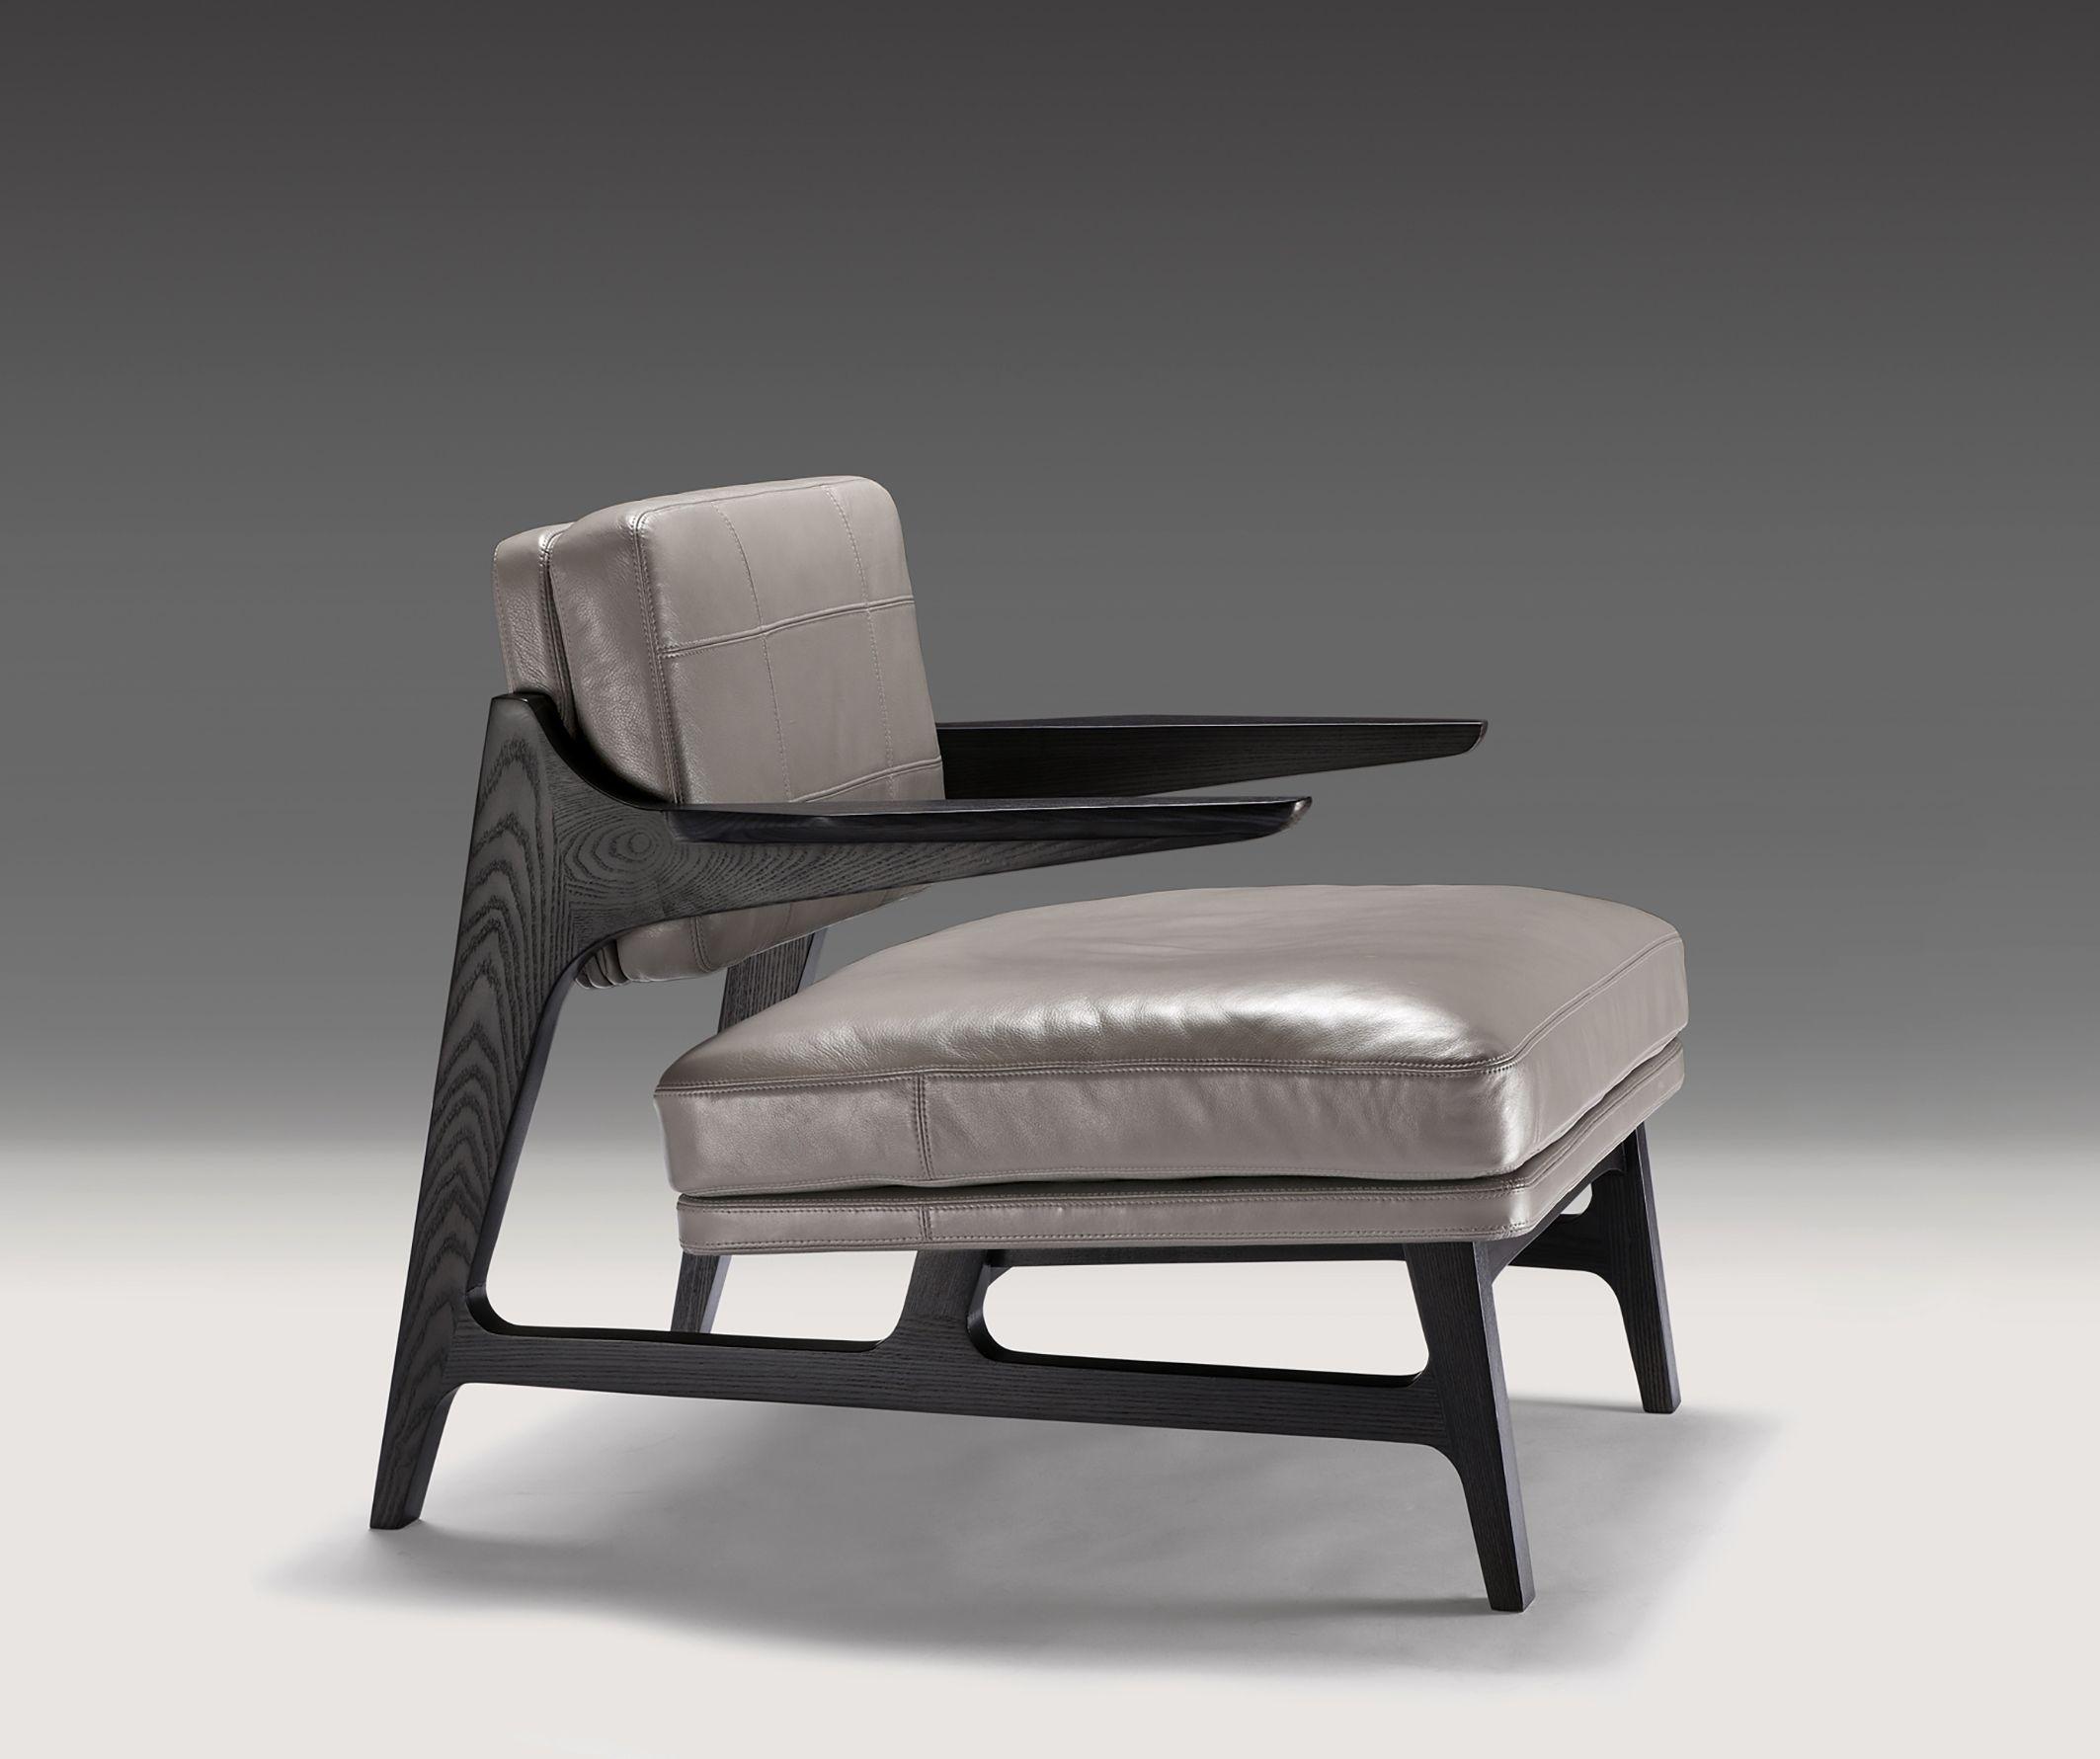 Miles Armchair By Studia Www Studiadesign Com Sofa Furniture Single Sofa Chair Furniture Design